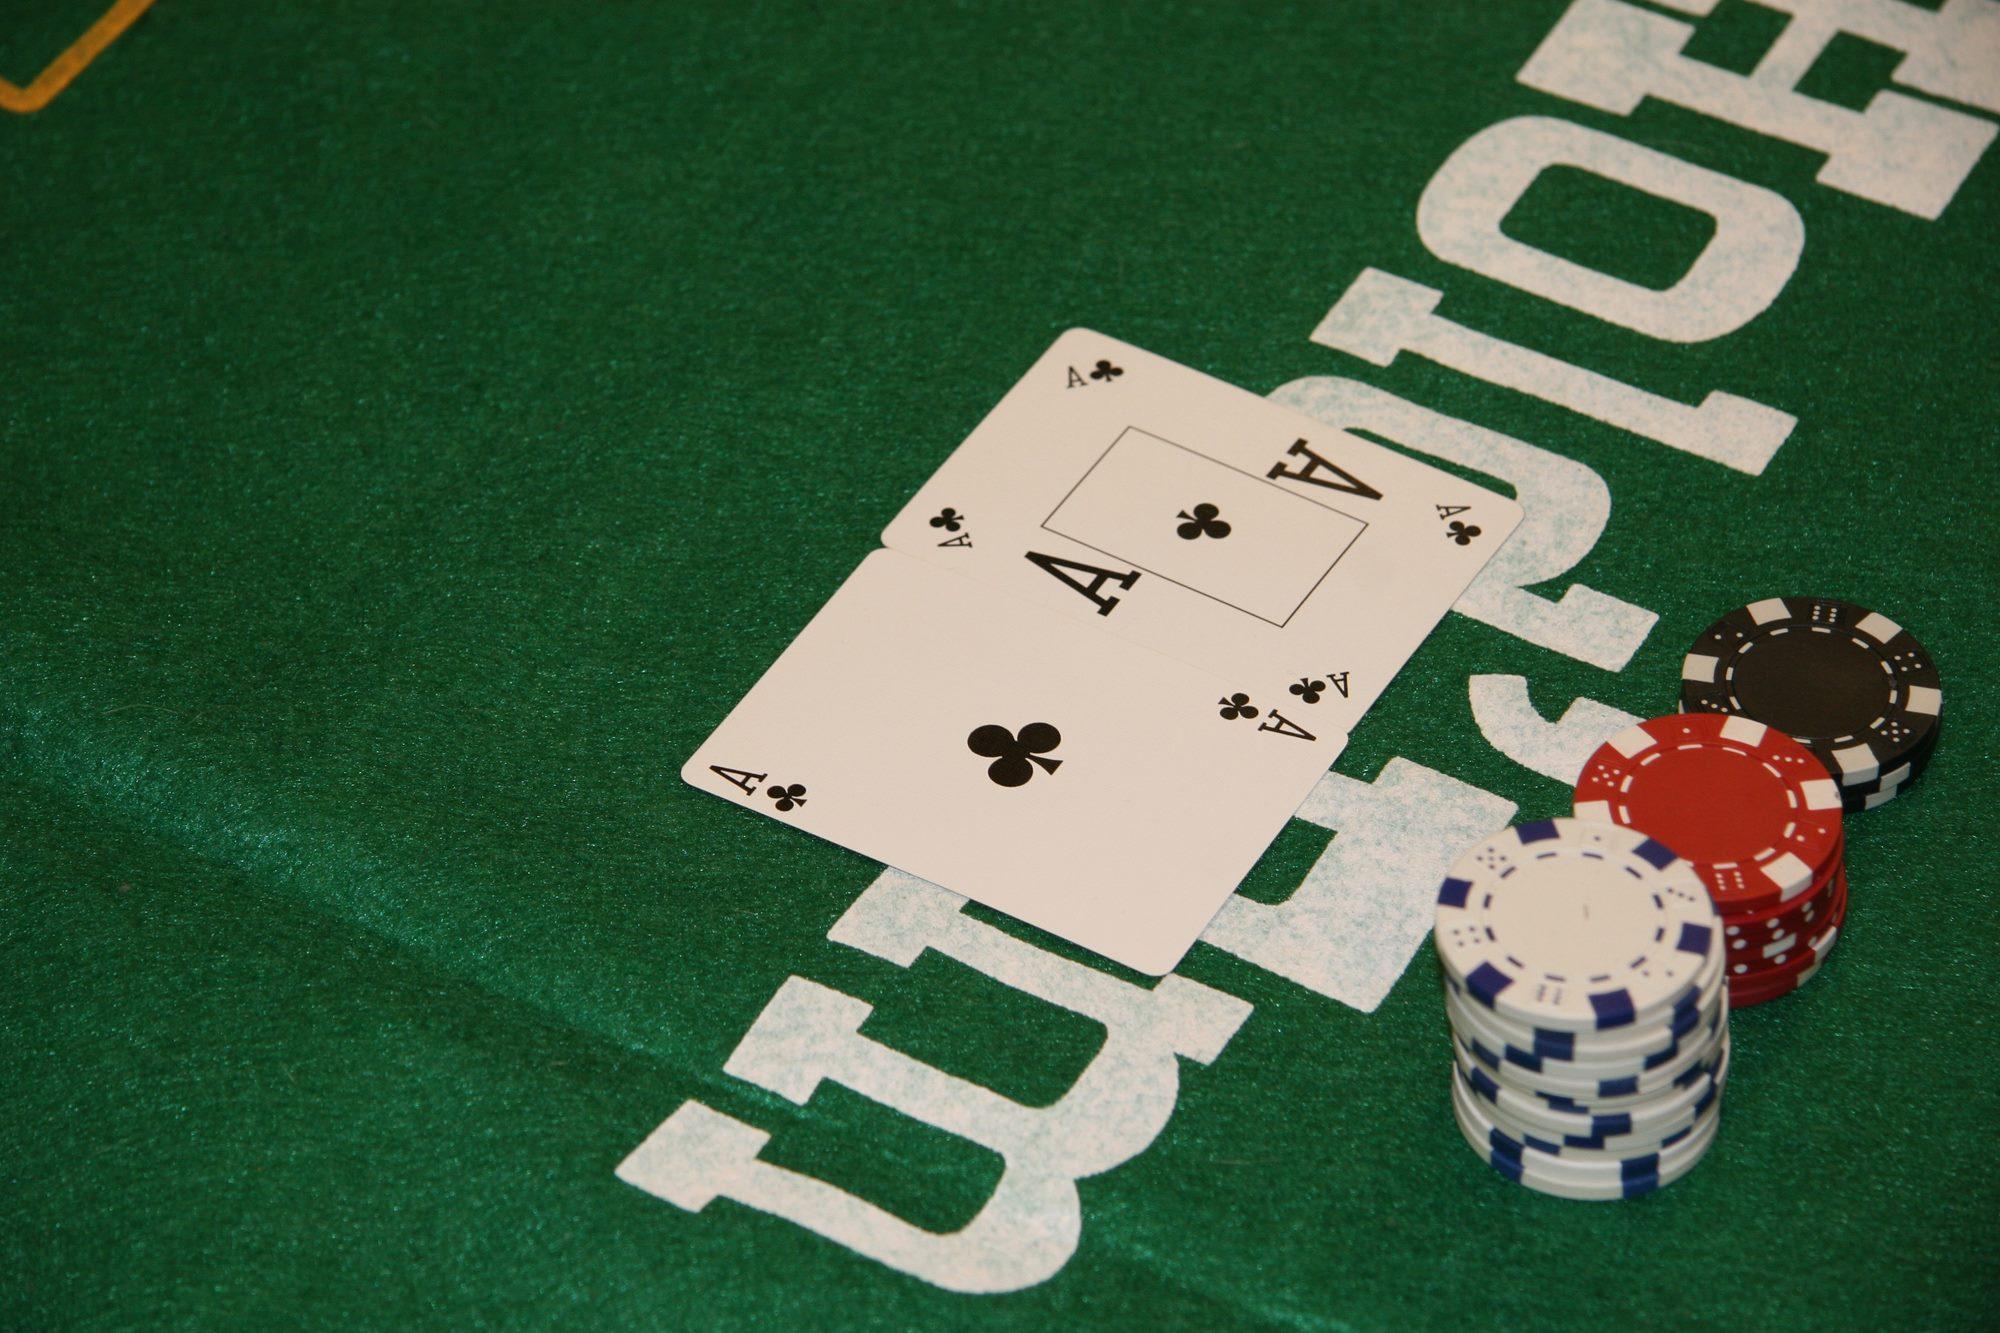 Alberta poker rally 2013